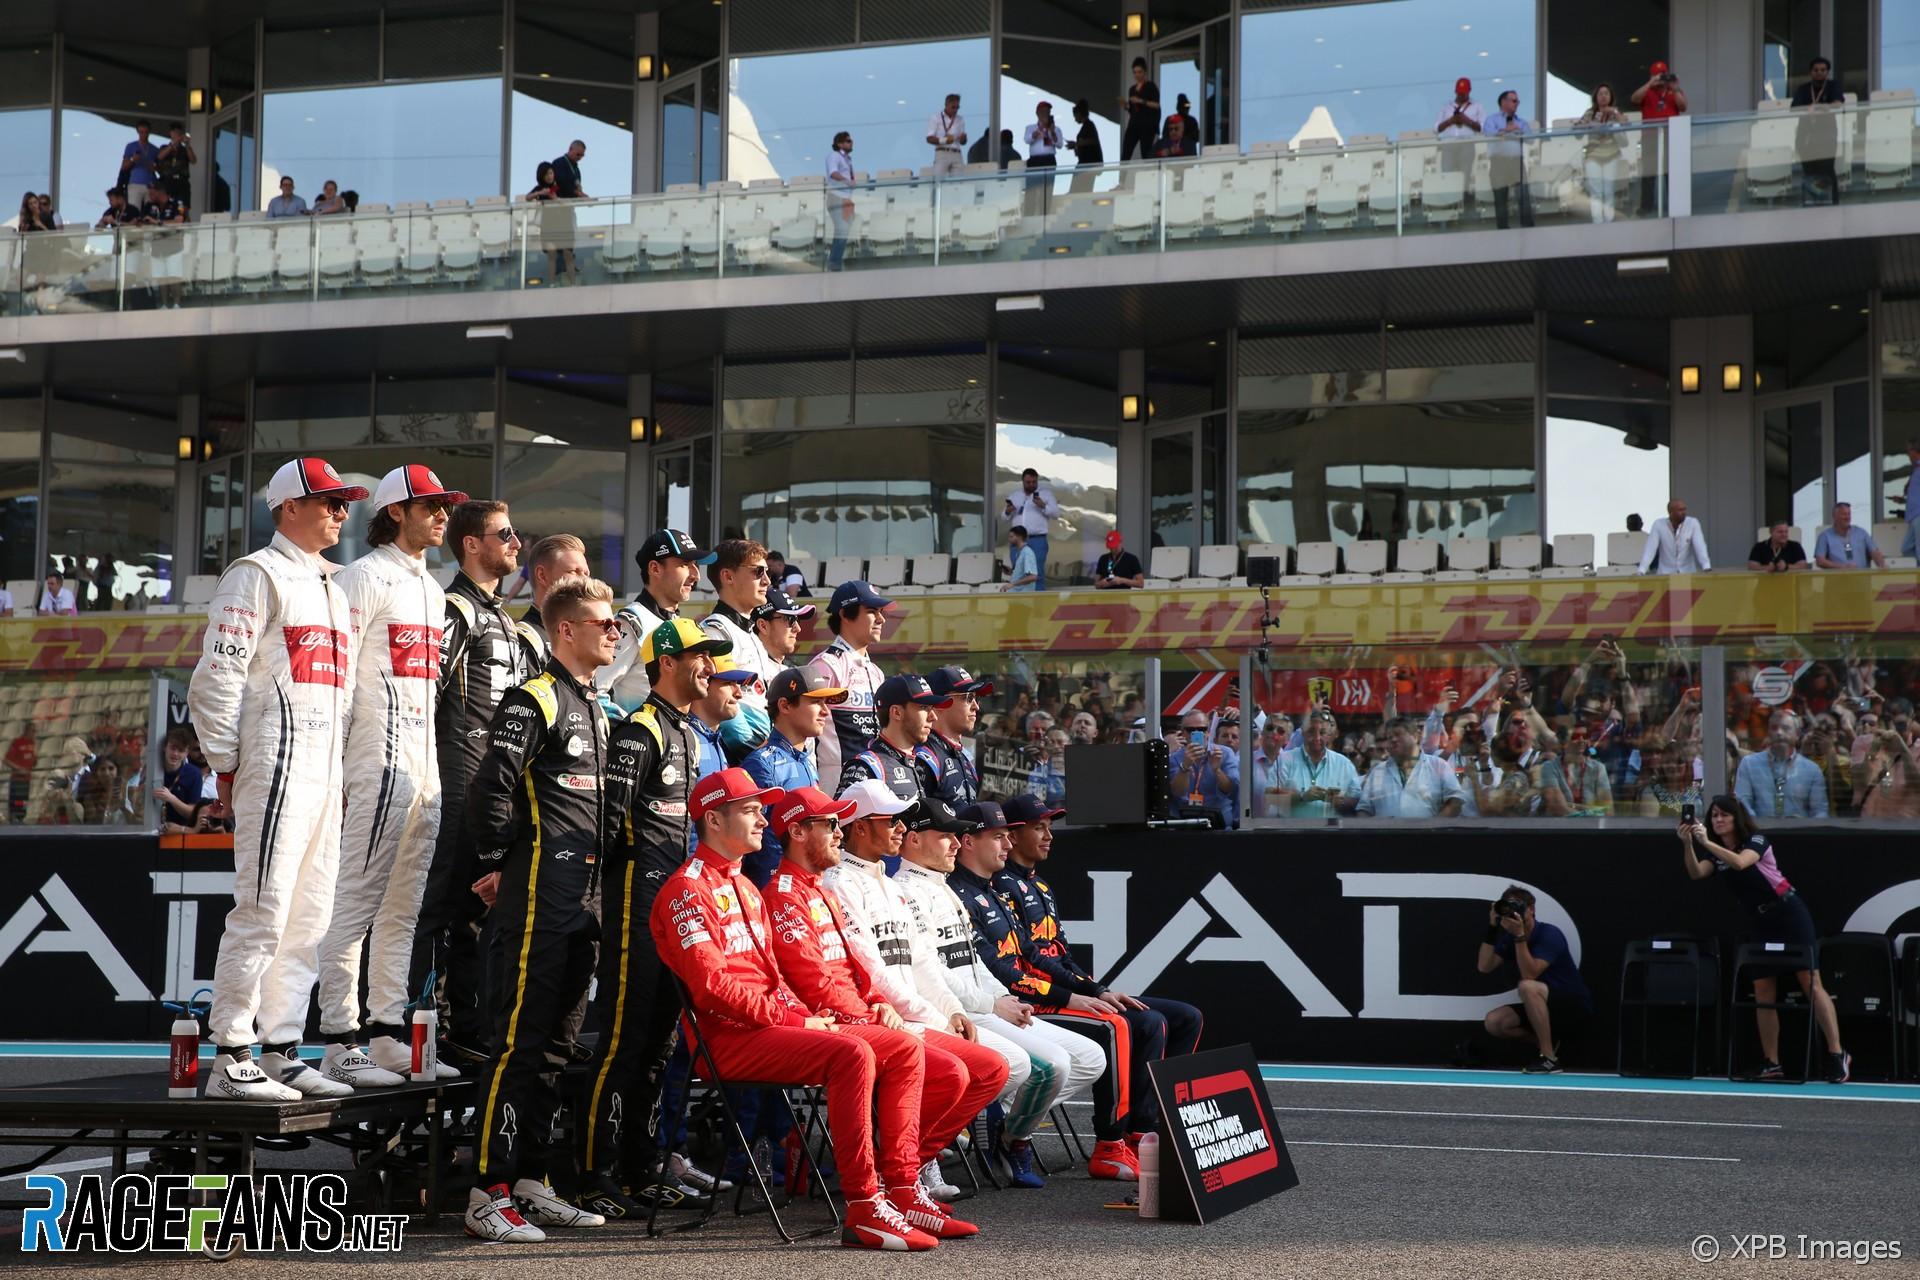 Drivers' end of season photograph, Yas Marina, 2019